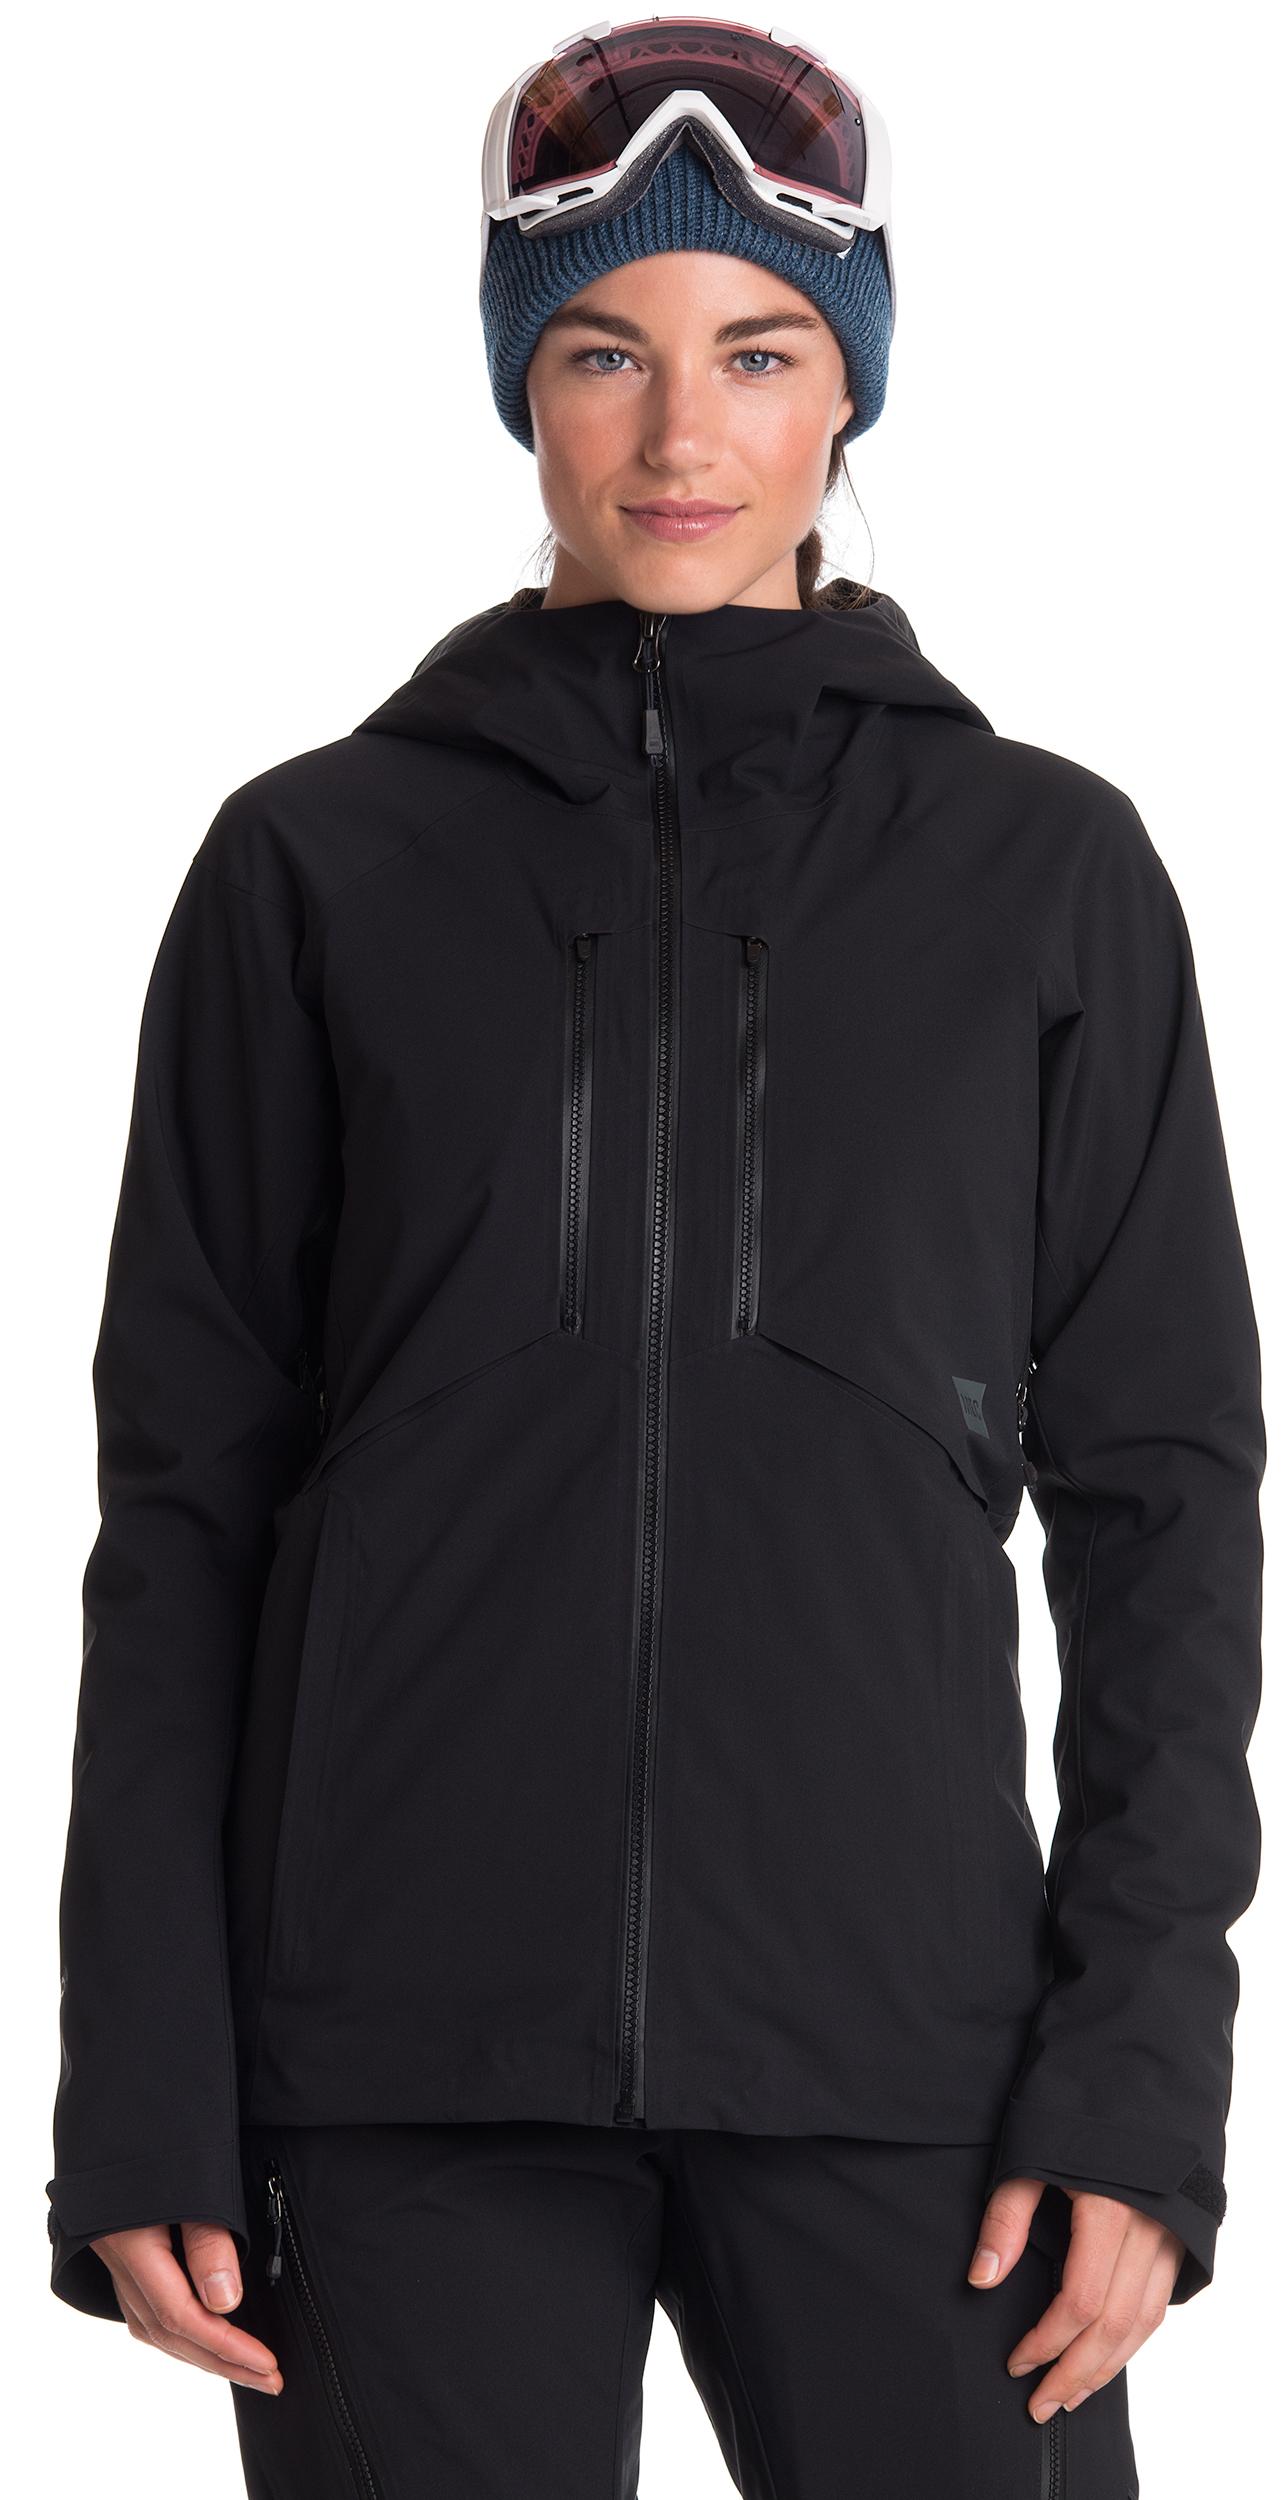 Nylon Jackets For Women